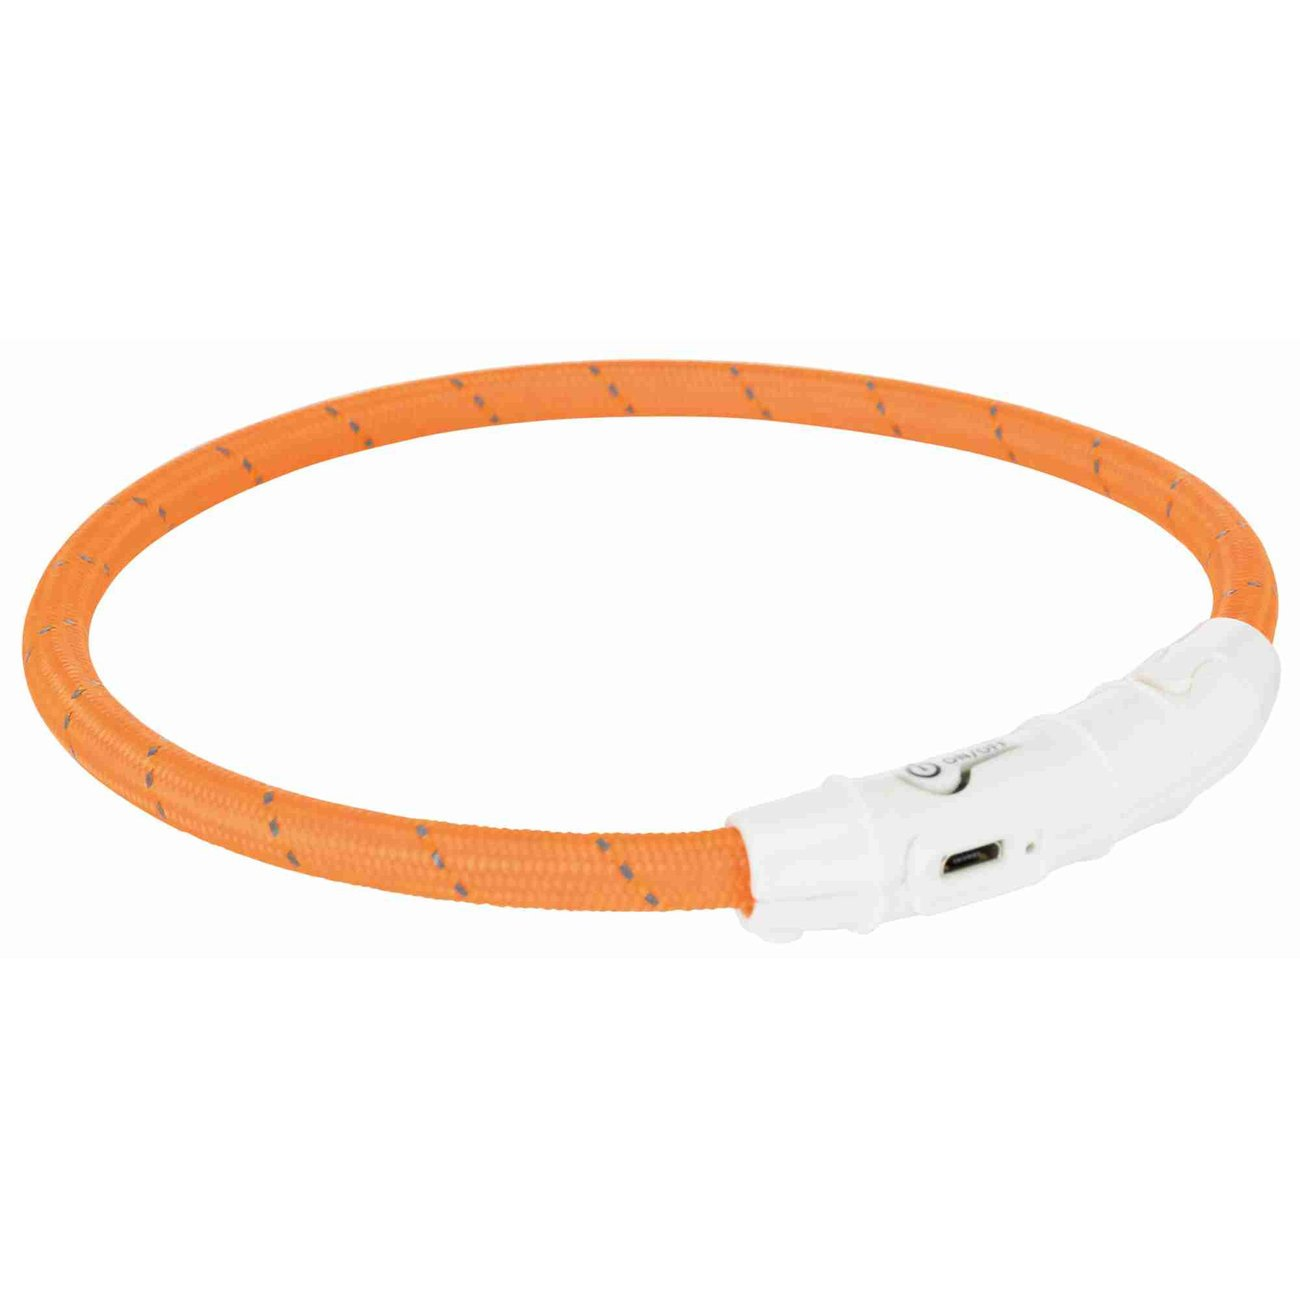 TRIXIE Hunde Leuchtring Nylon USB 12691, Bild 3